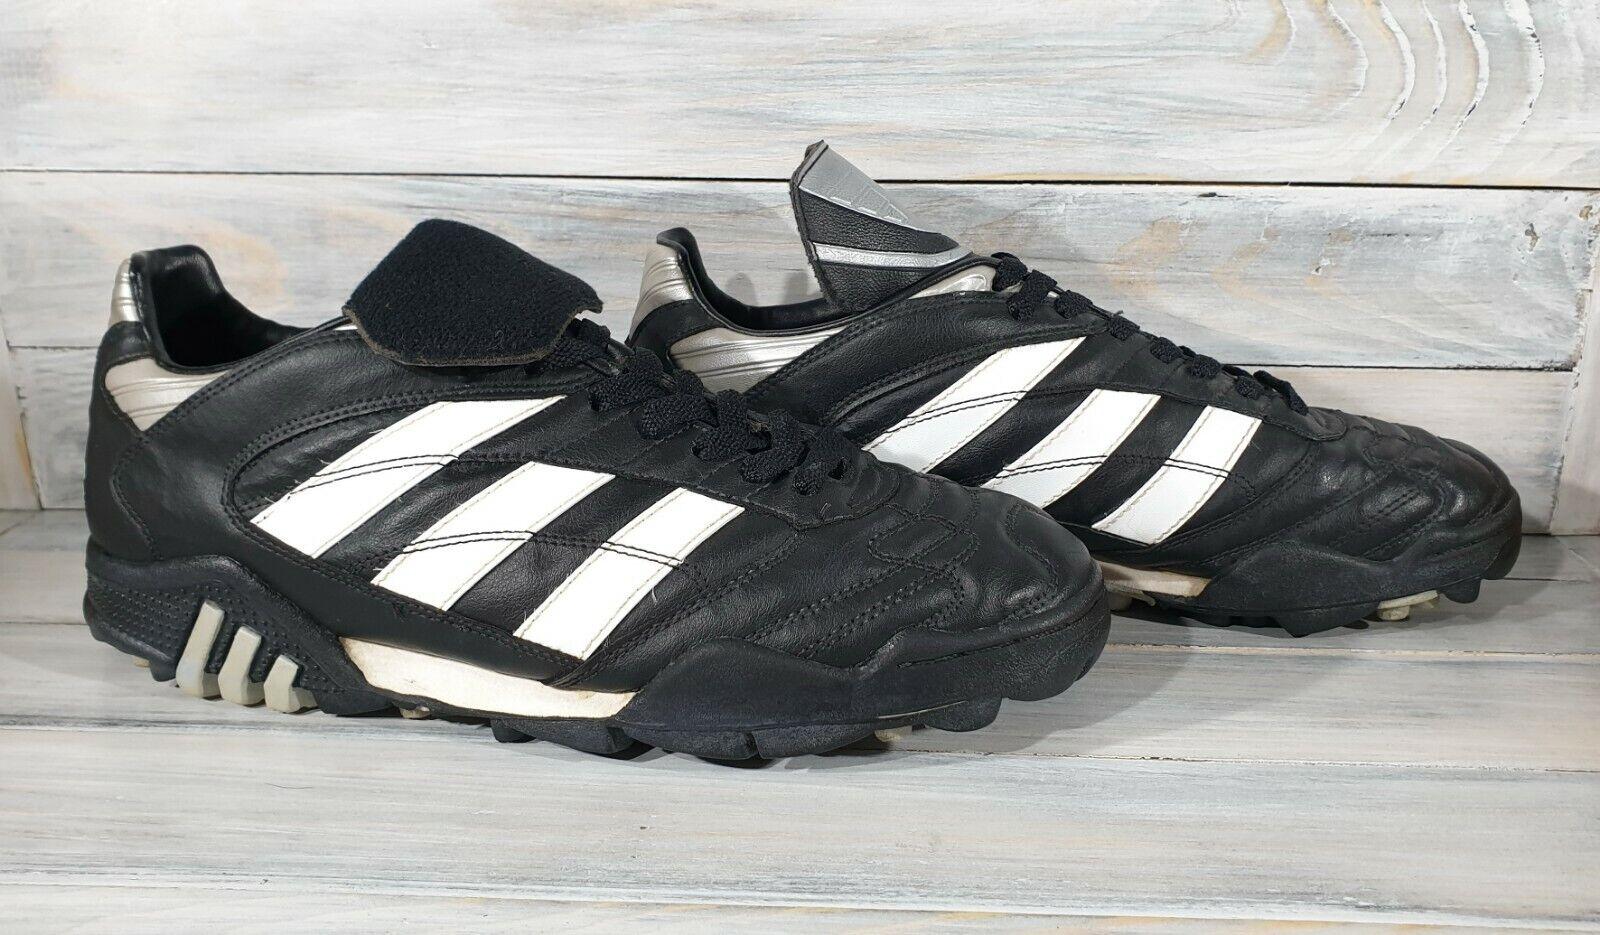 Vintage Adidas football boots 1996 , size 9 1 2 , rare